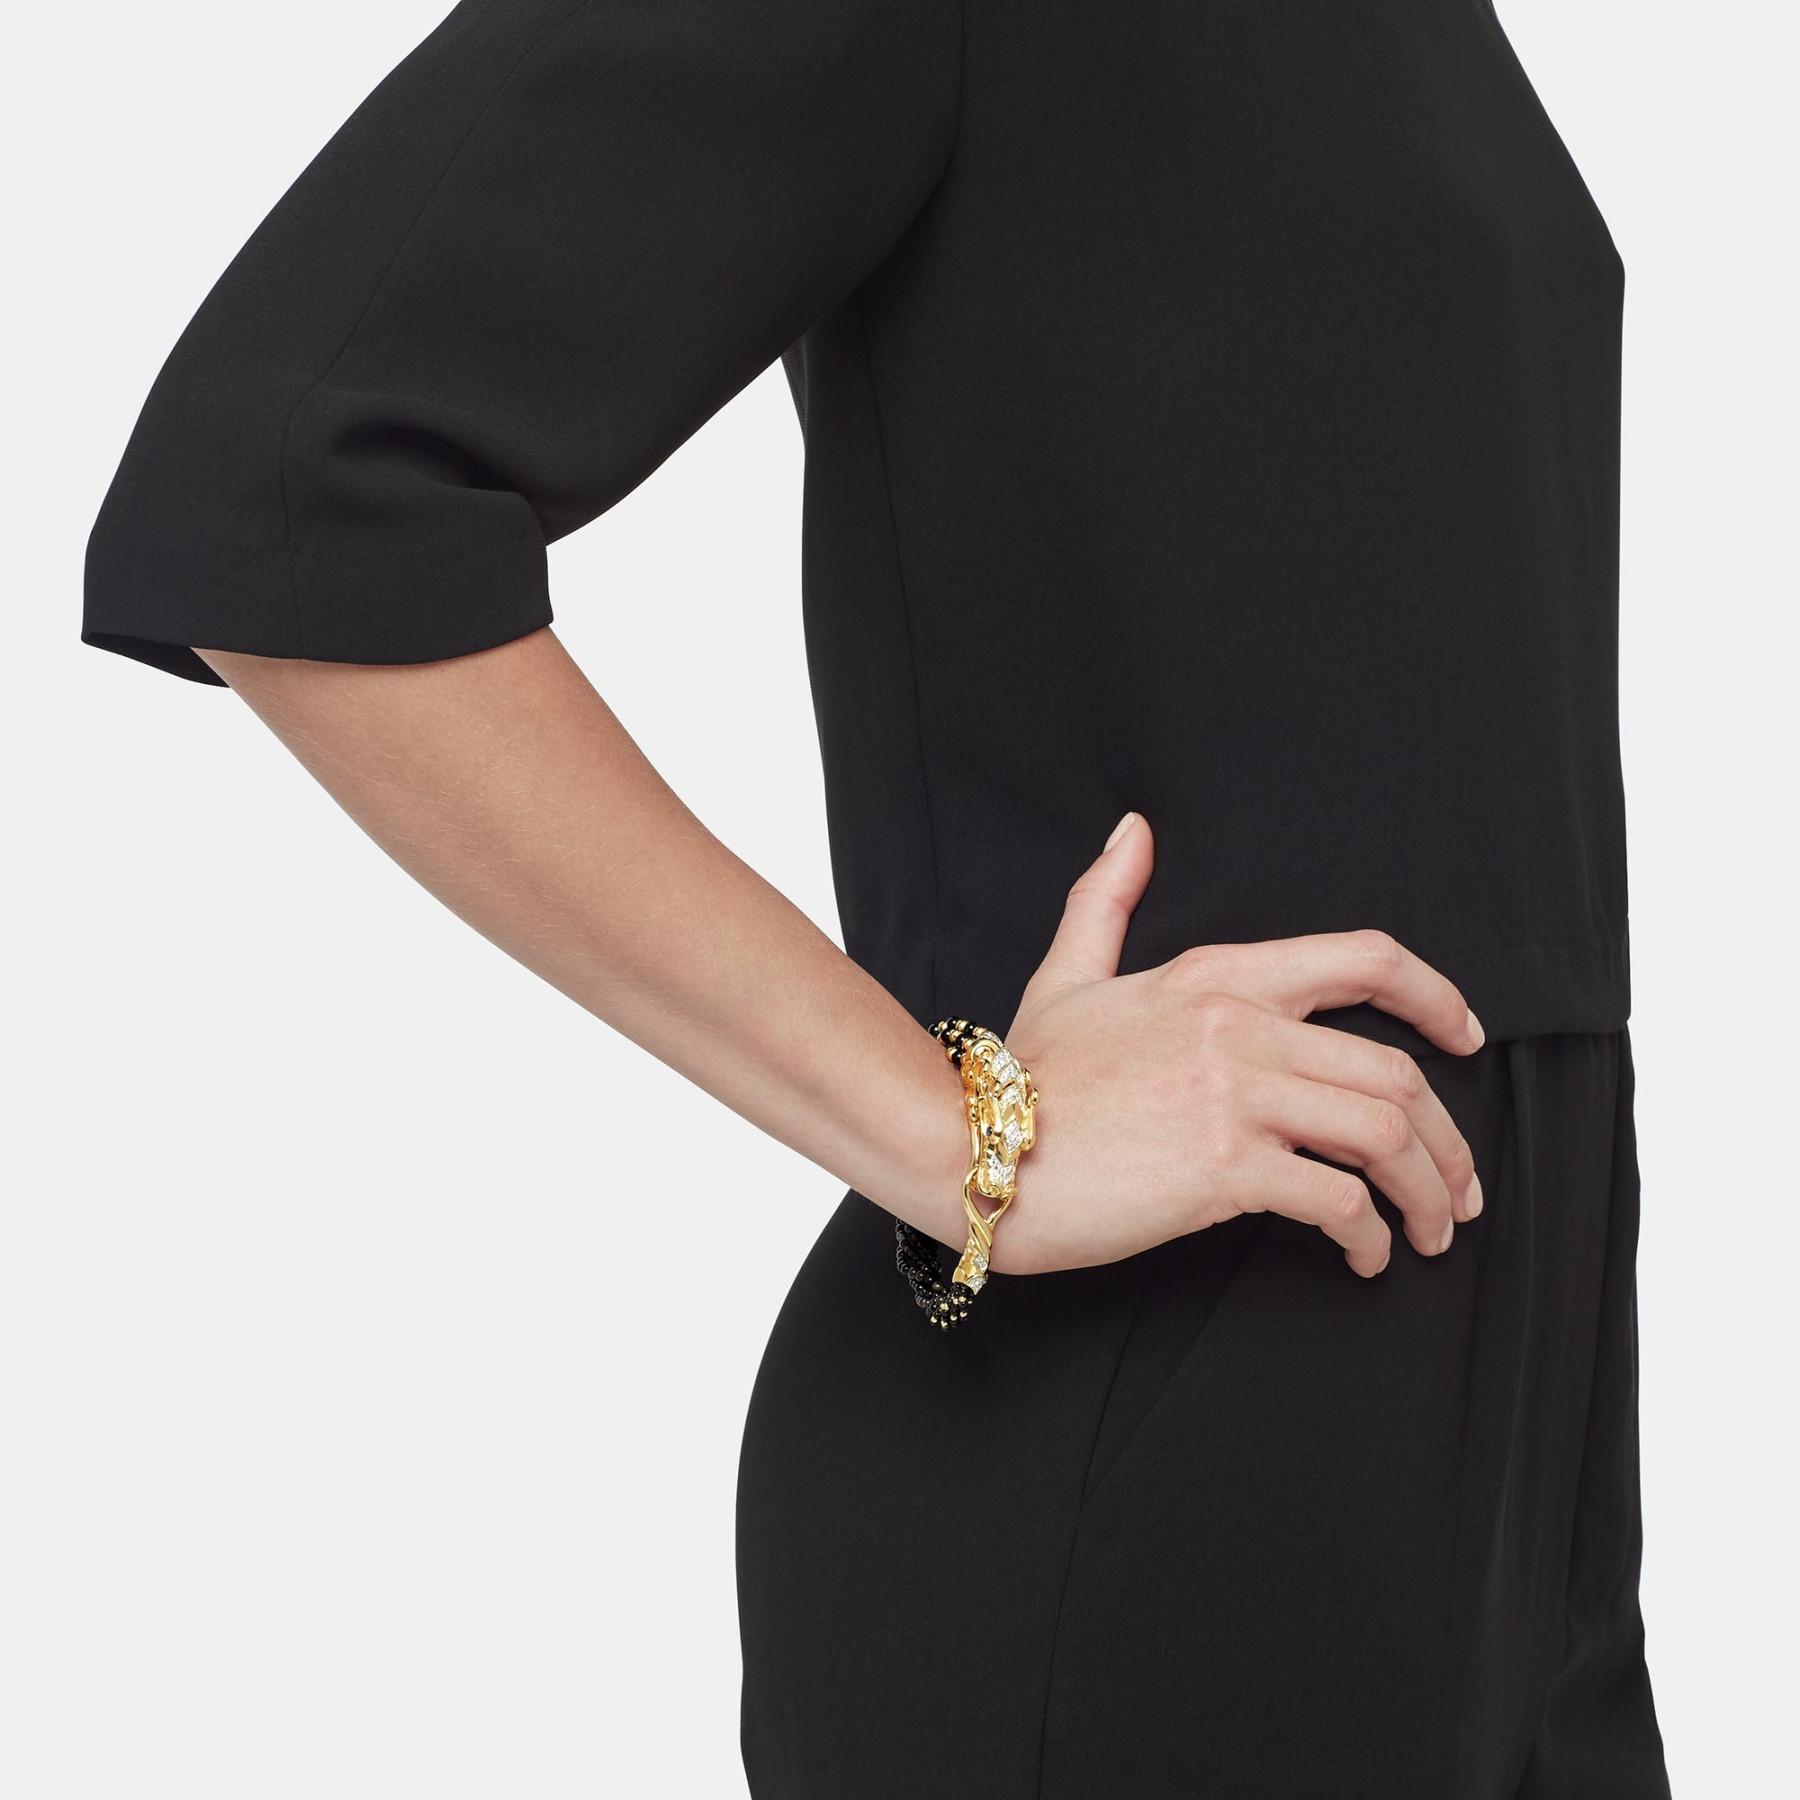 John Hardy Legends Naga Medium Black Mother of Pearl Bead Bracelet on model